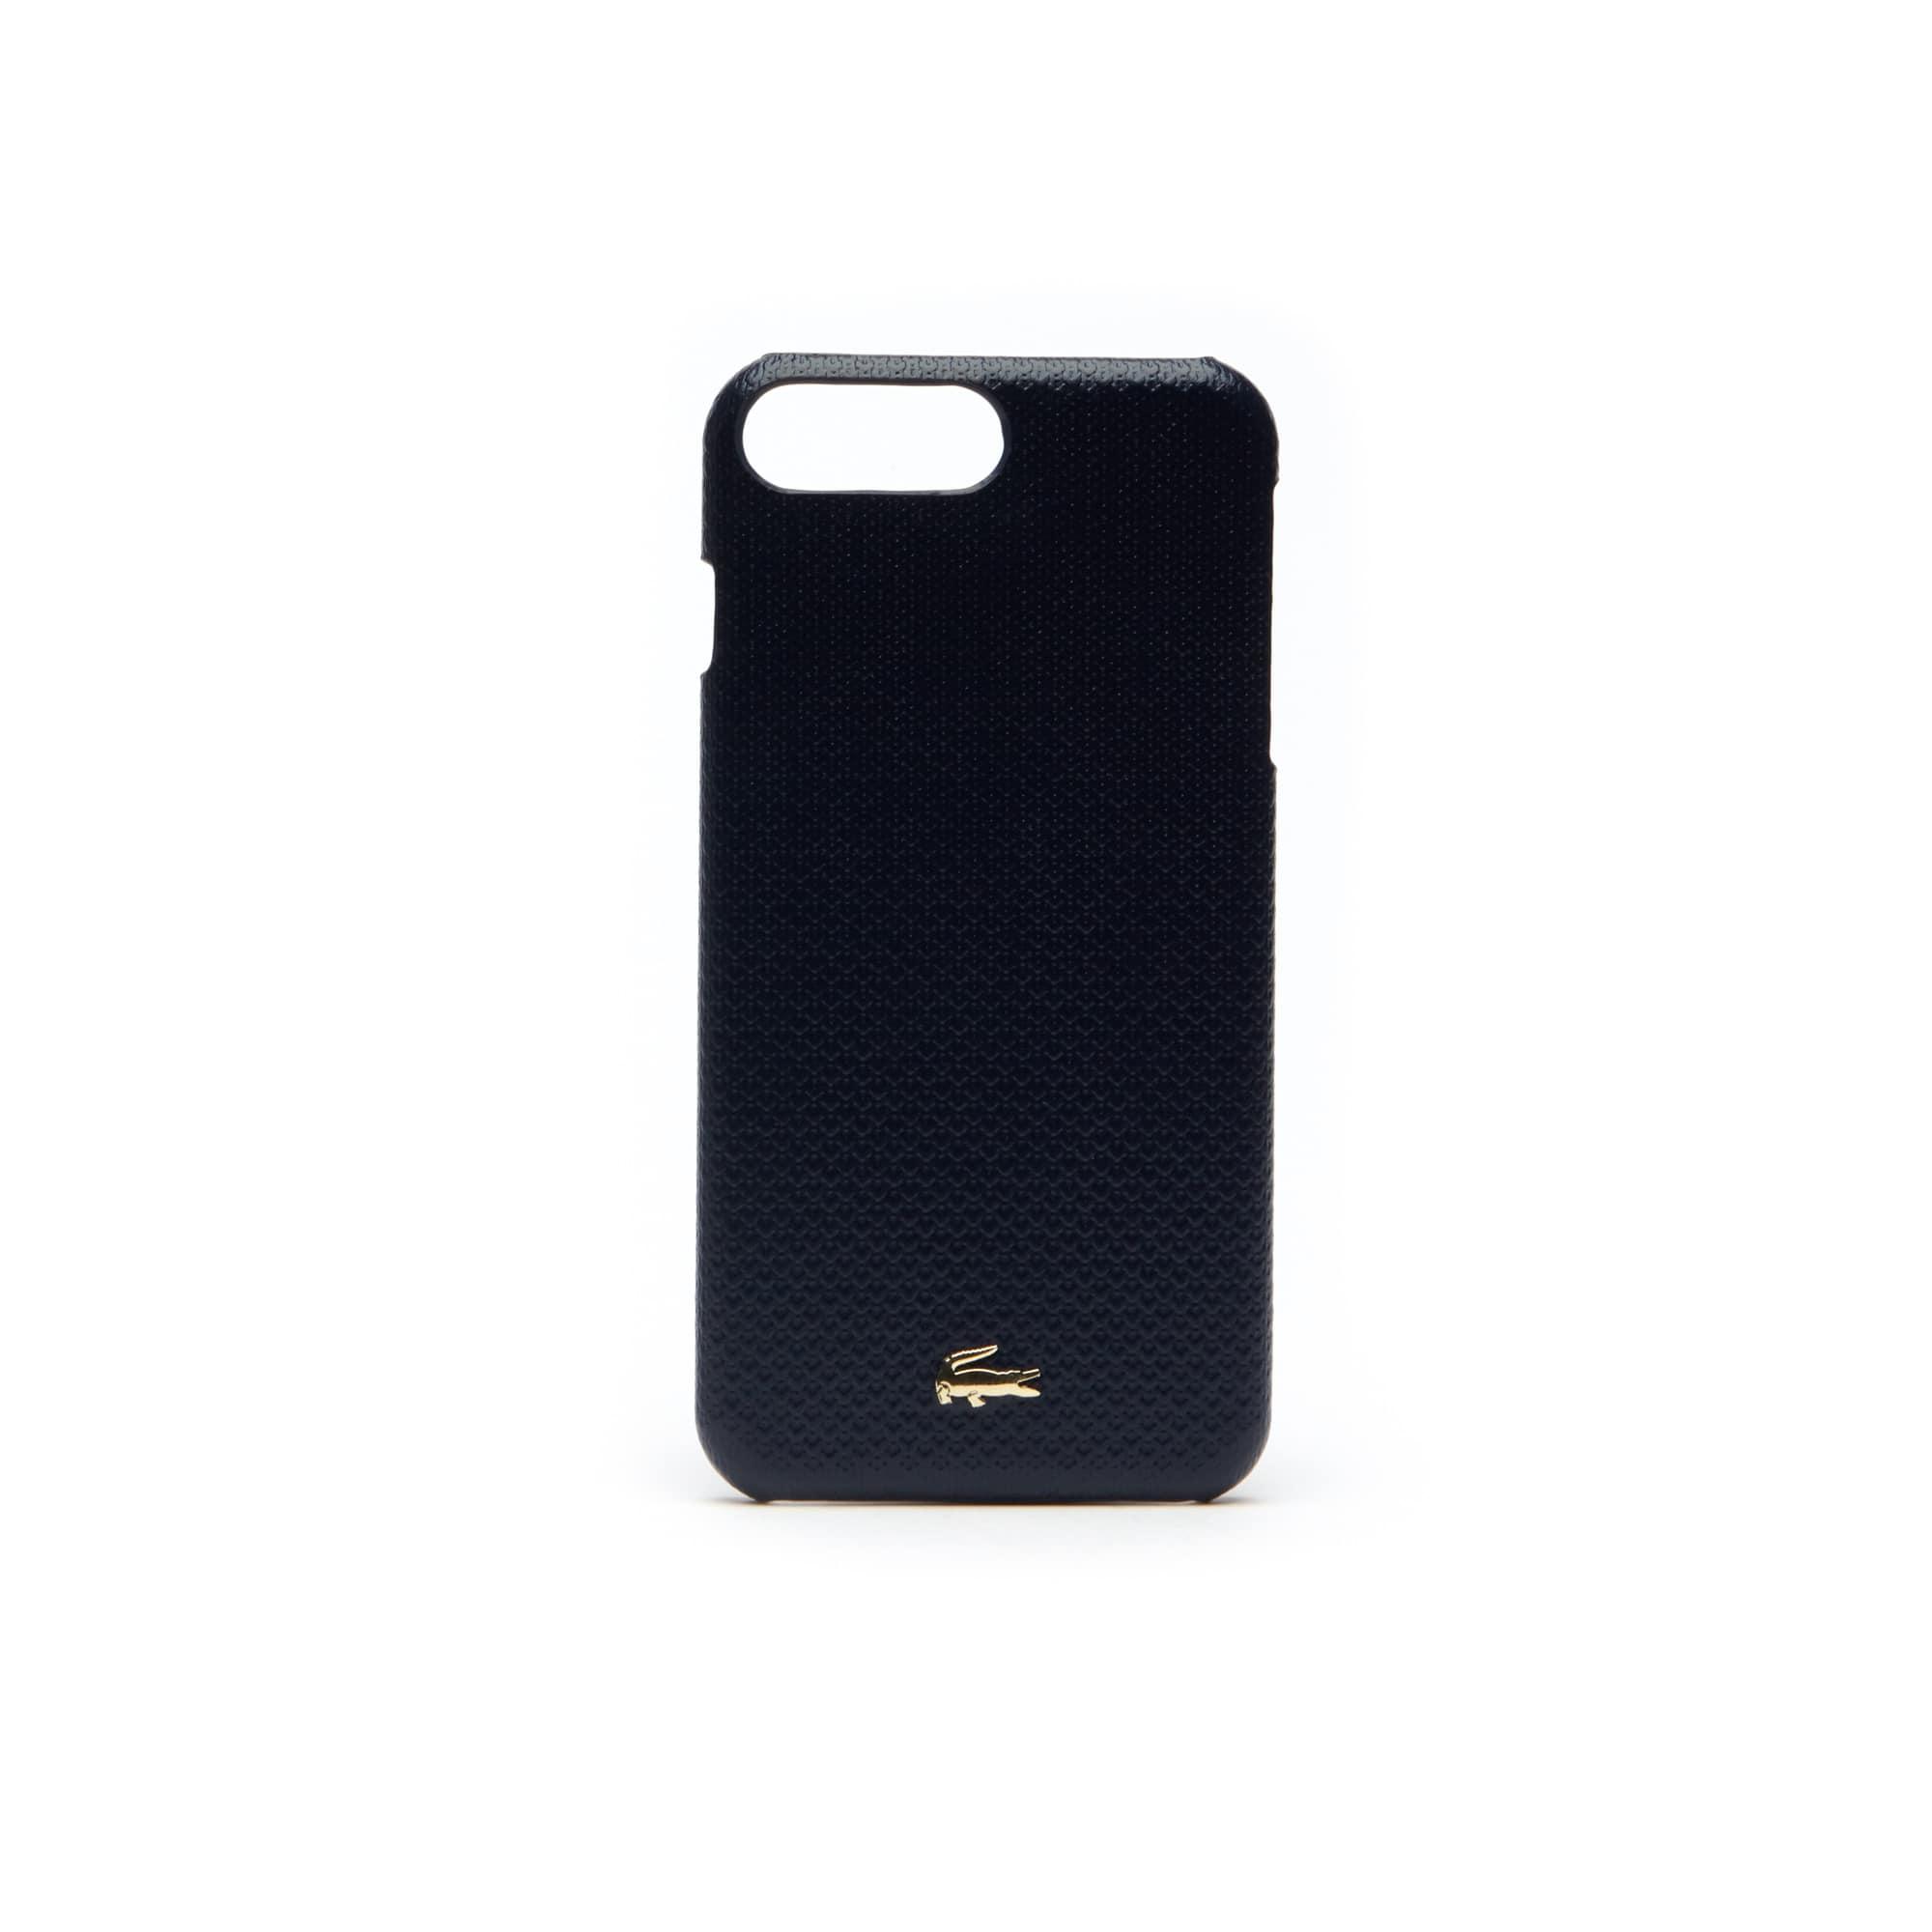 iPhone 8-hoes Chantaco dames piquéleer